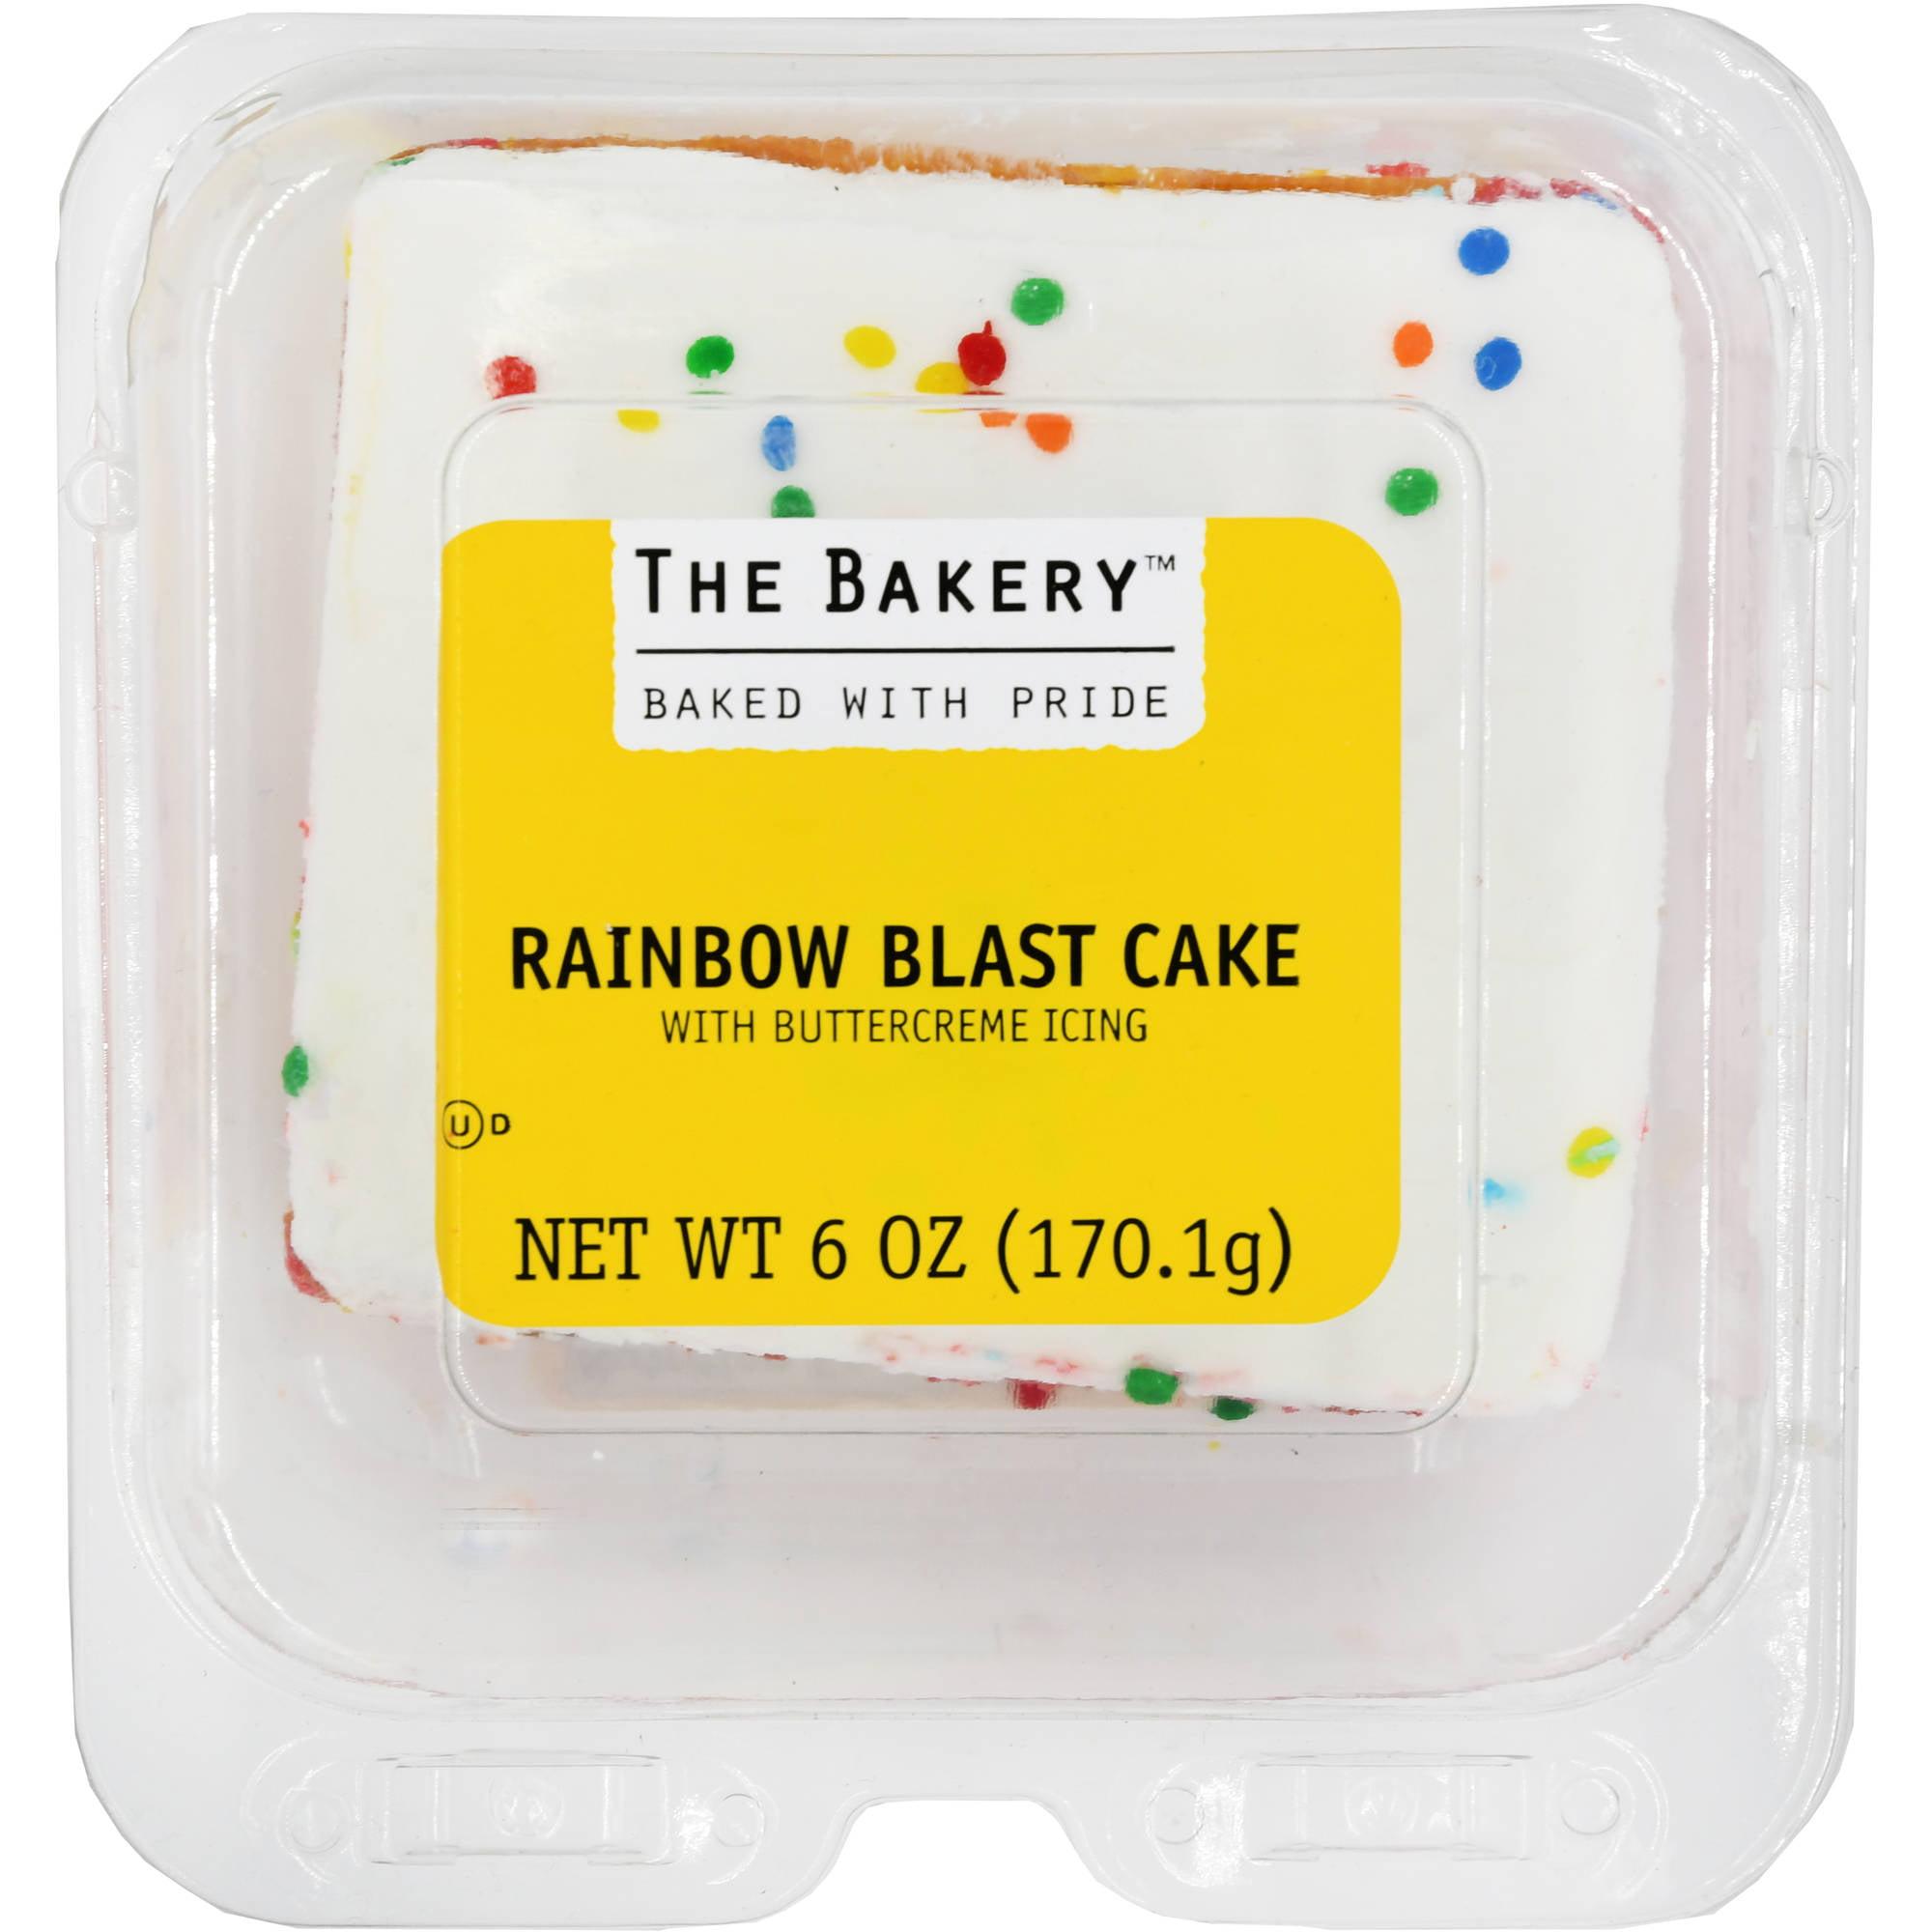 the bakery at walmart rainbow blast square cake 6 oz